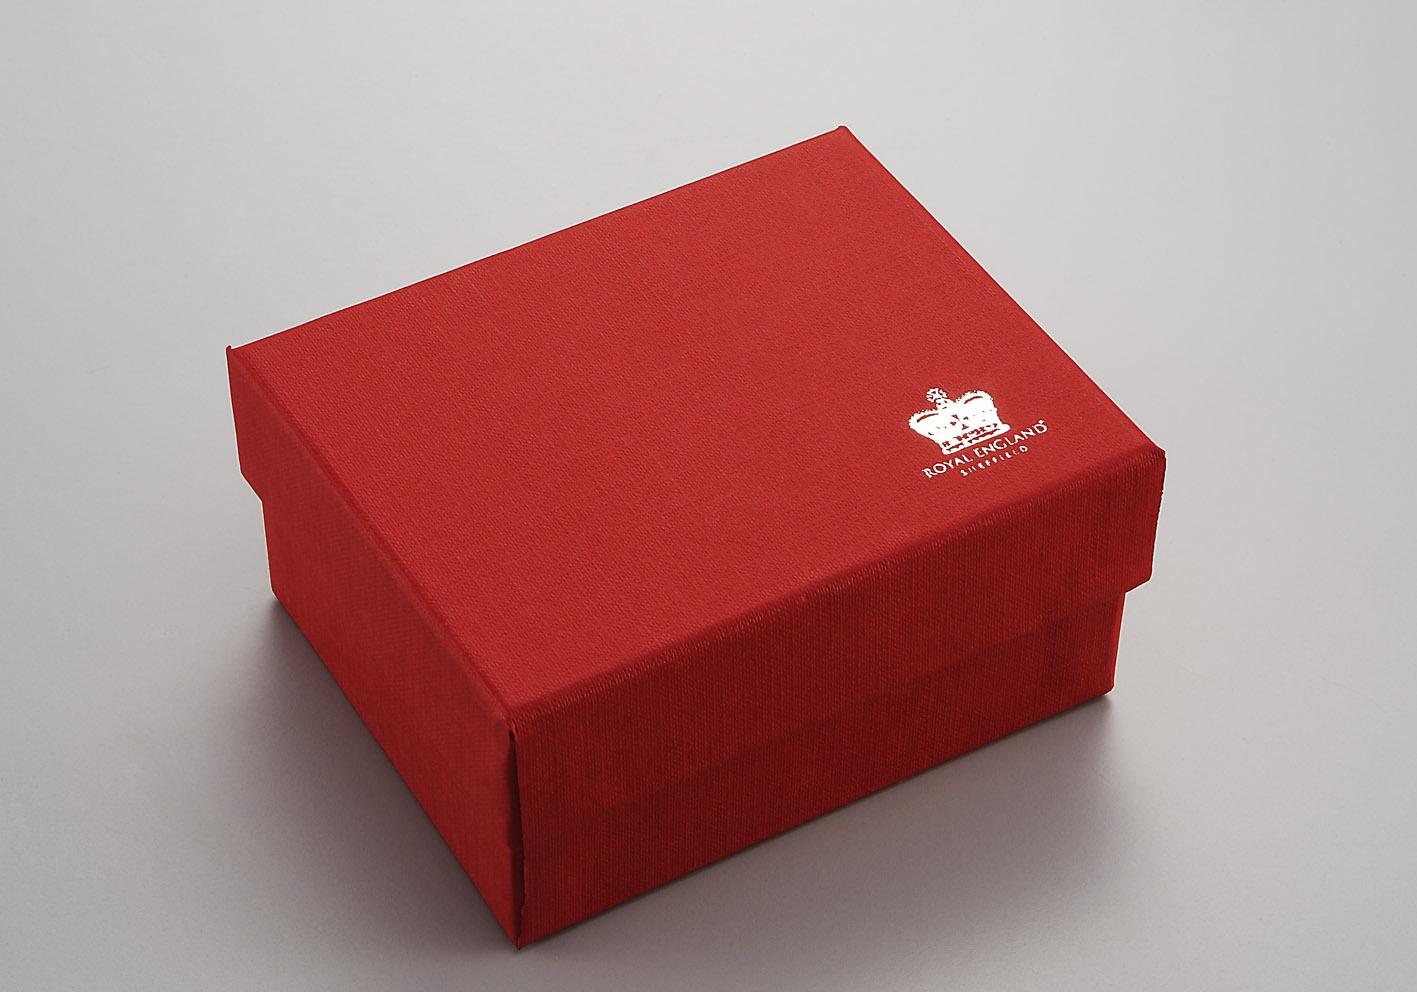 Scatola rossa cm.27x5x4,5h